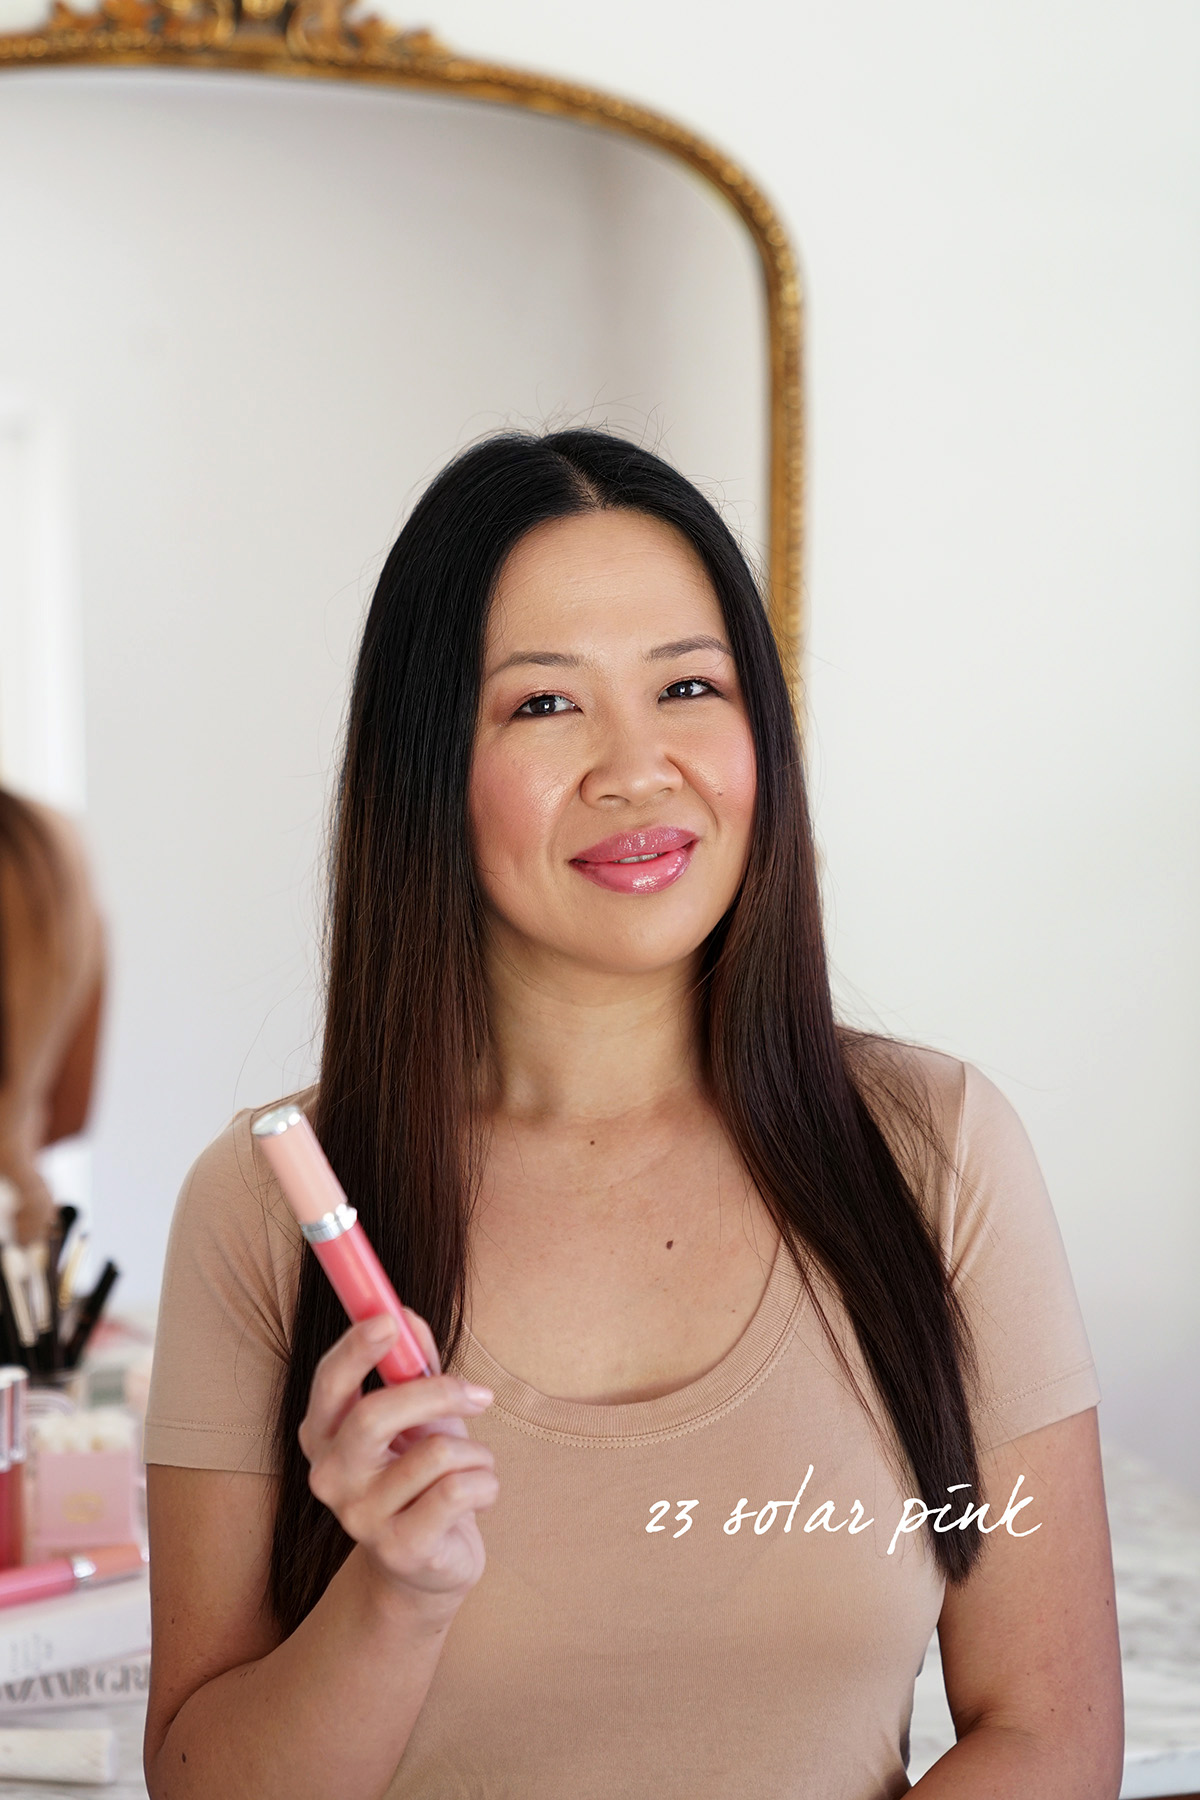 Givenchy Le Rose Perfecto Liquid Balm 23 Solar Pink